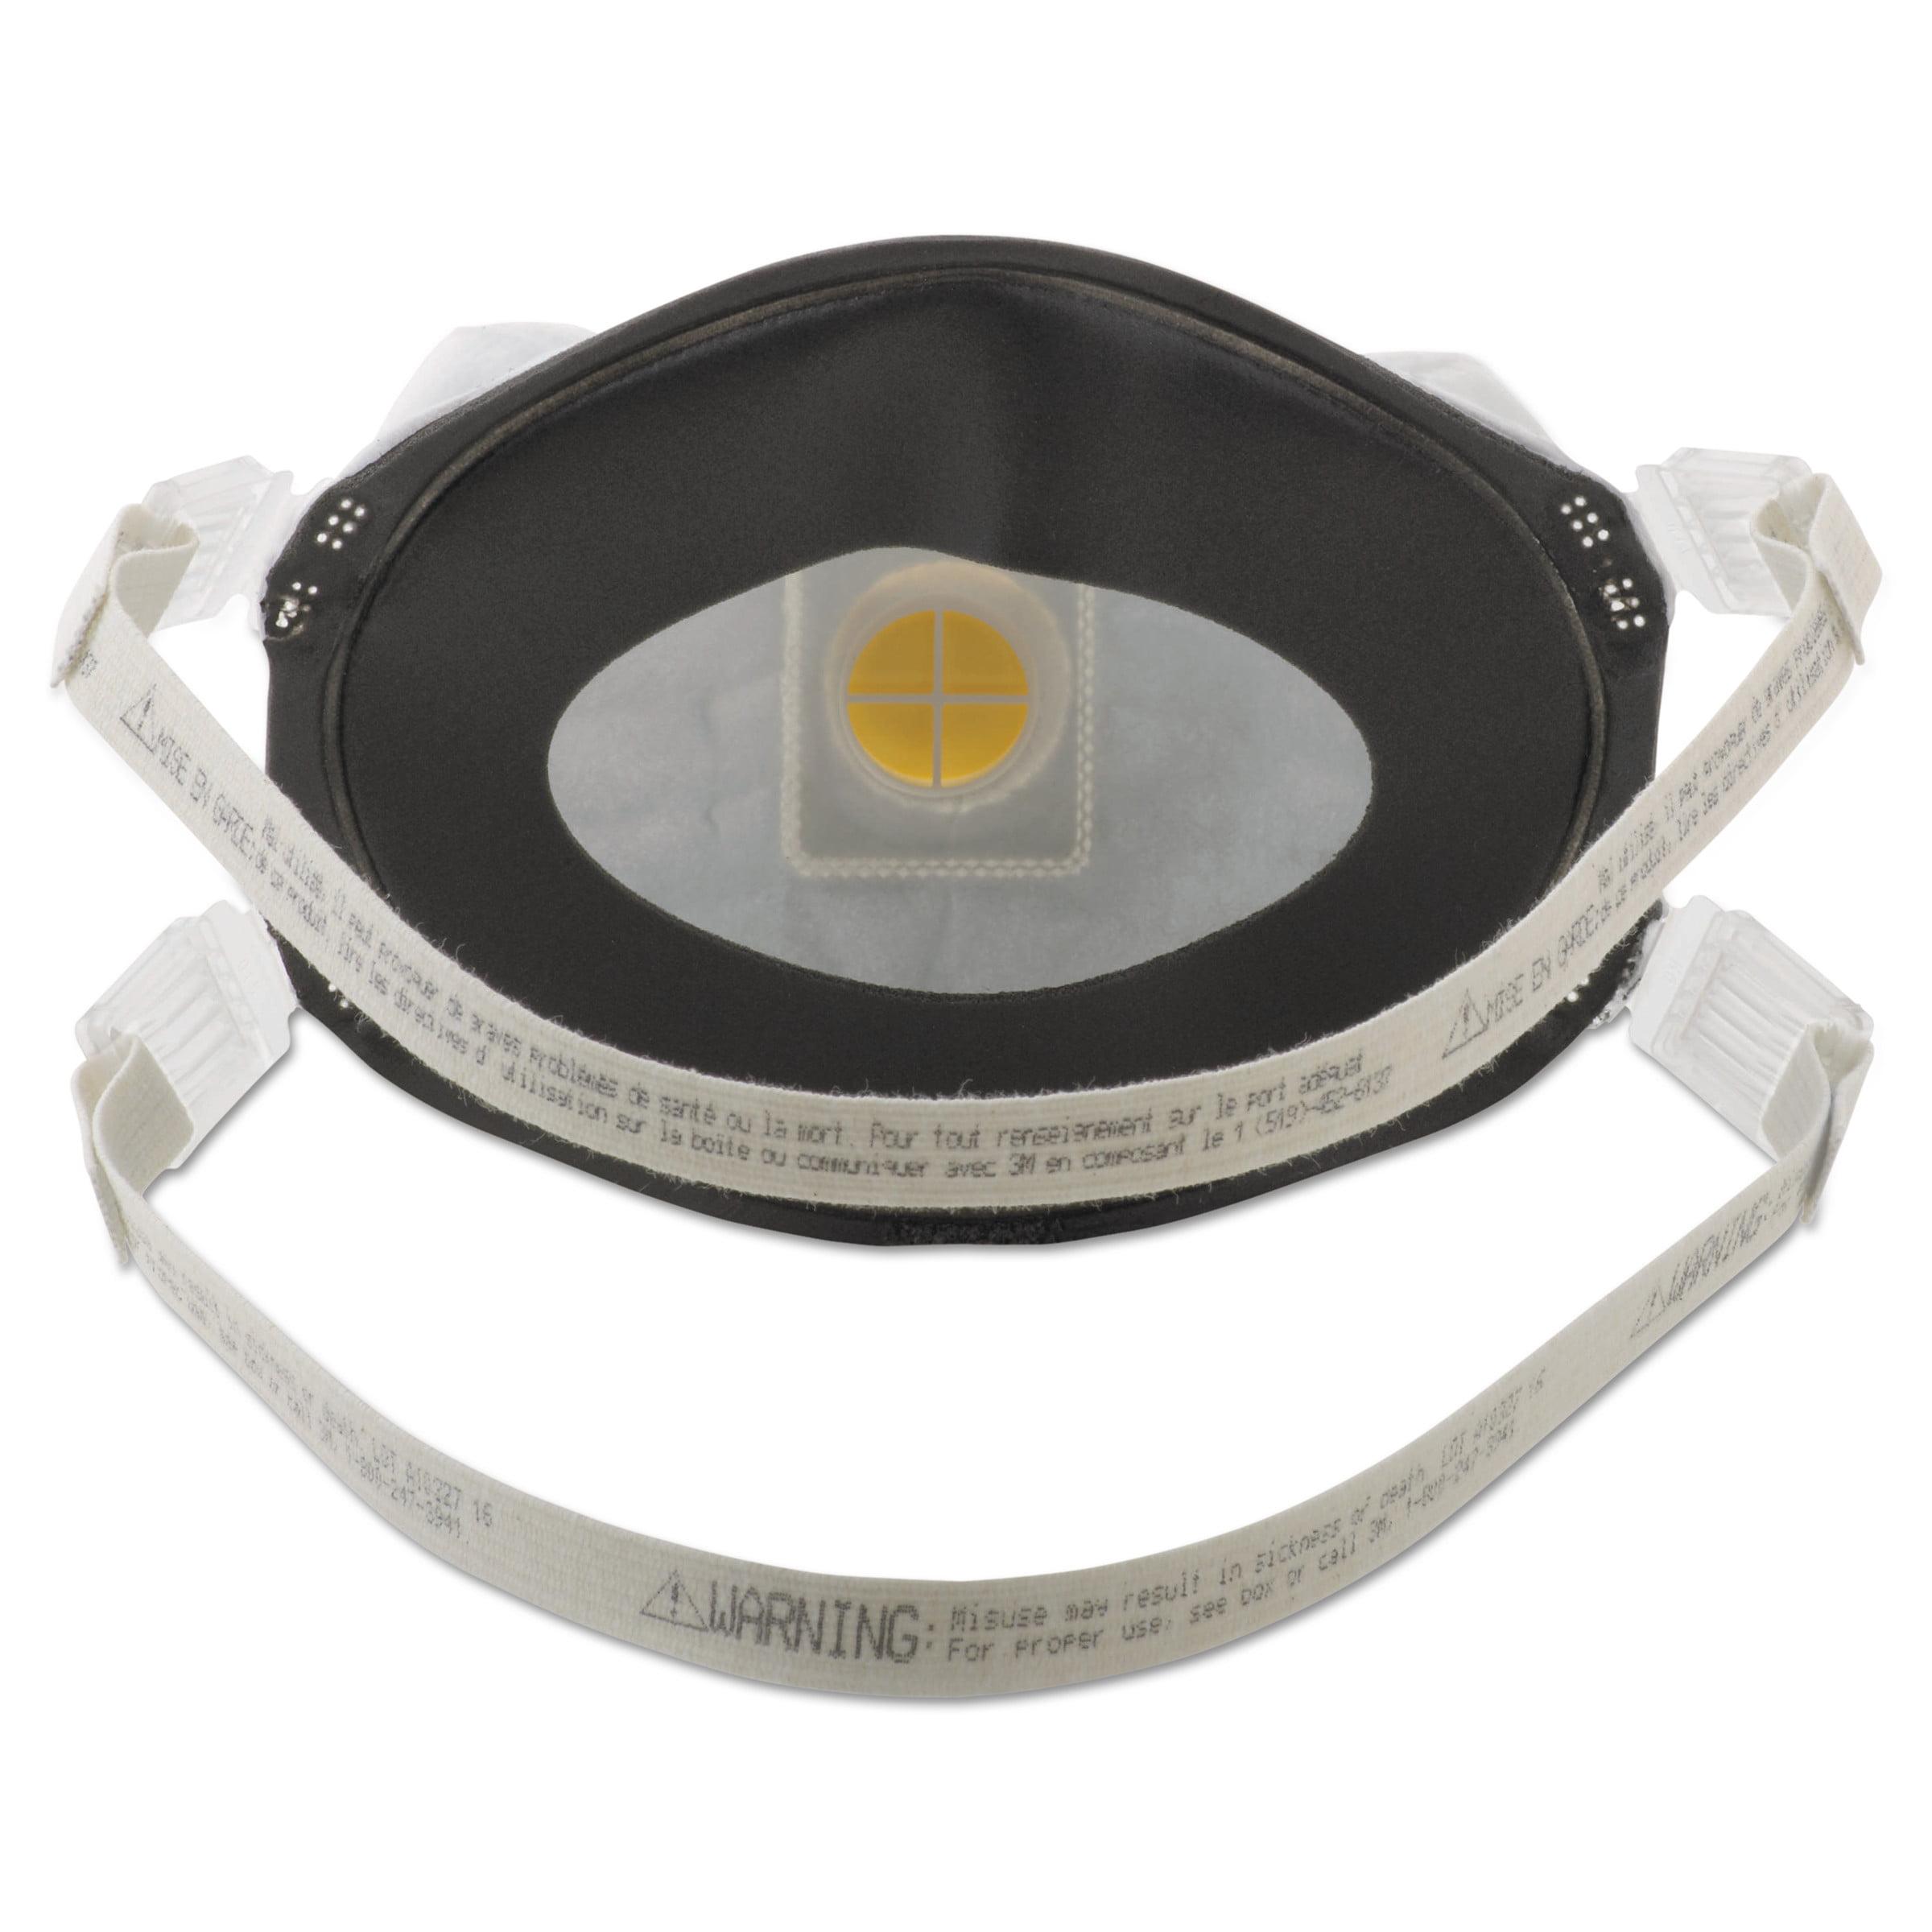 n-100 respirator mask